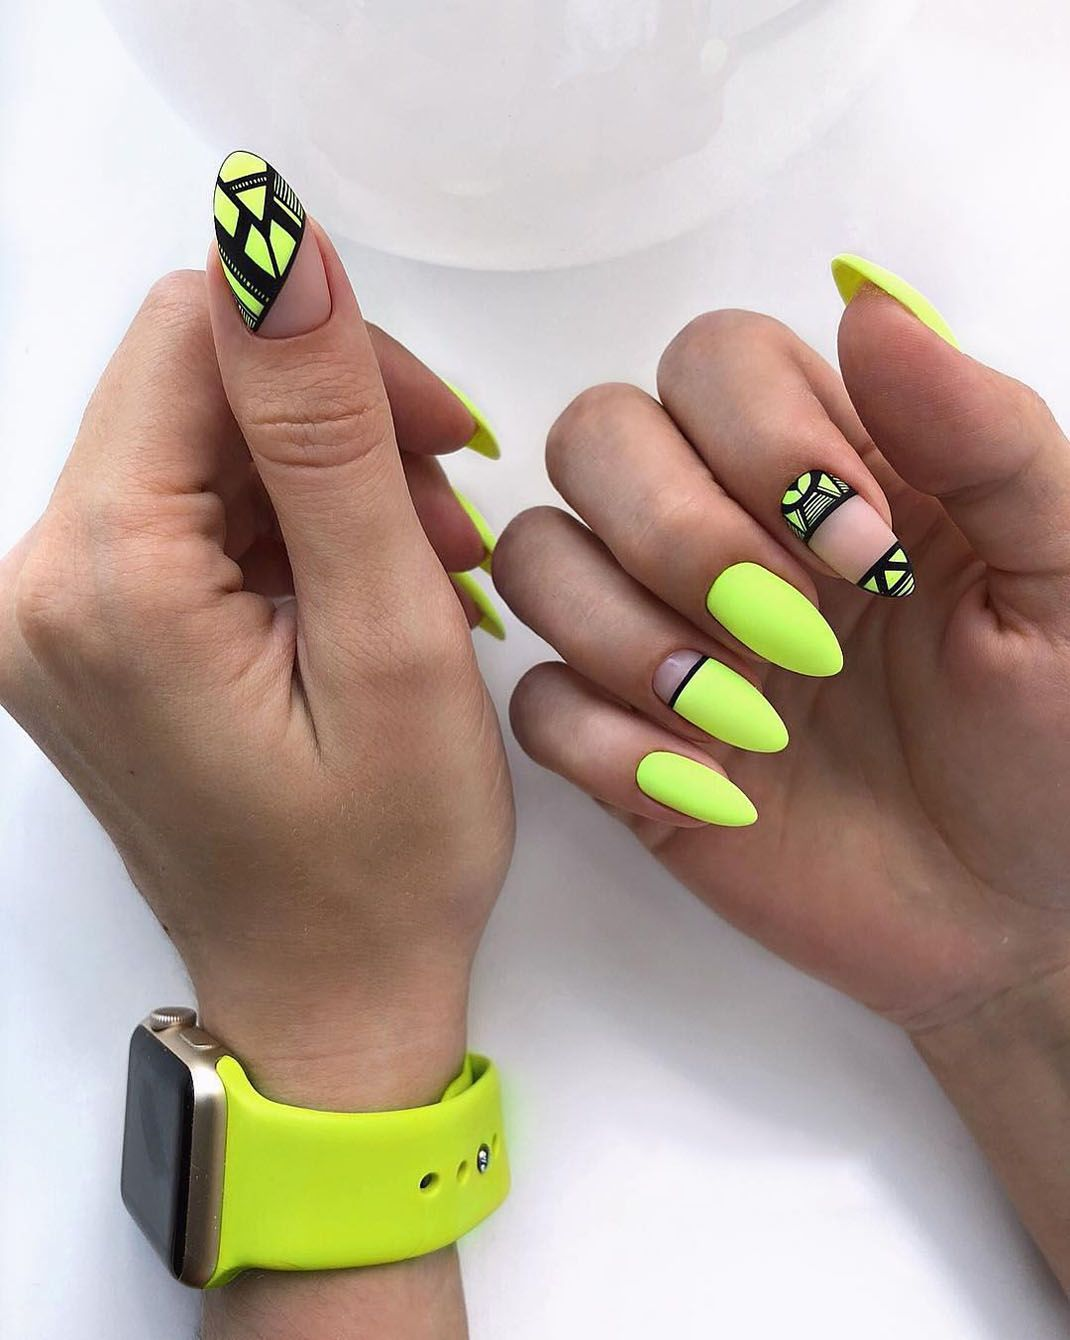 45 Glamorous Nail Arts And Designs For 2018 19 Long Acrylic Nail Designs Yellow Nails Yellow Nail Art